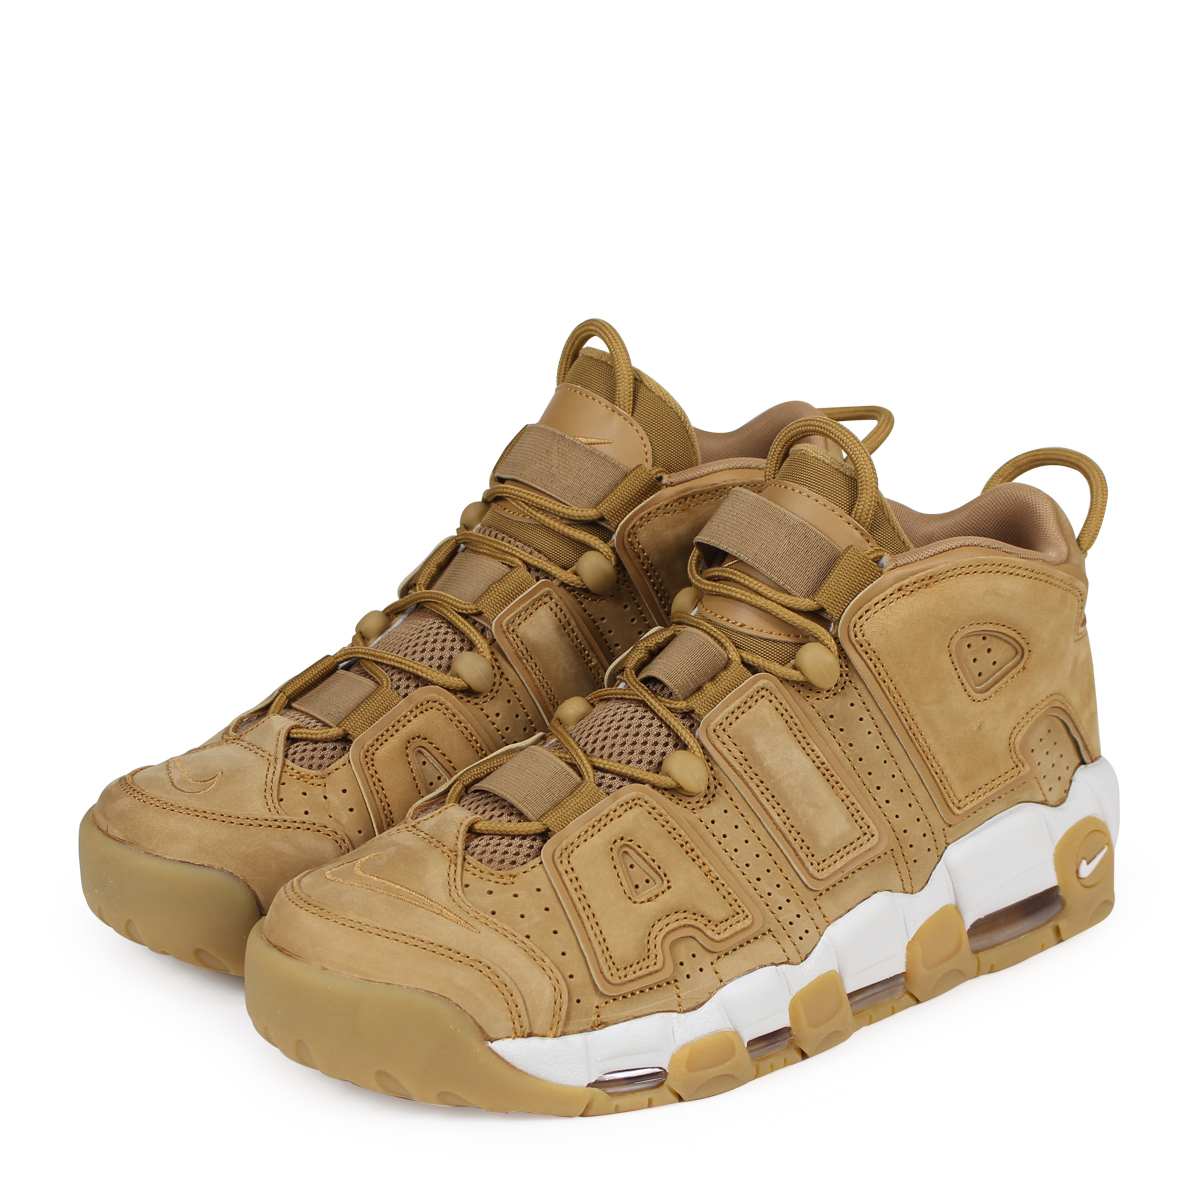 7167bd54f0 NIKE AIR MORE UPTEMPO 96 PREMIUM Nike air more up tempo sneakers men  AA4060-200 ...